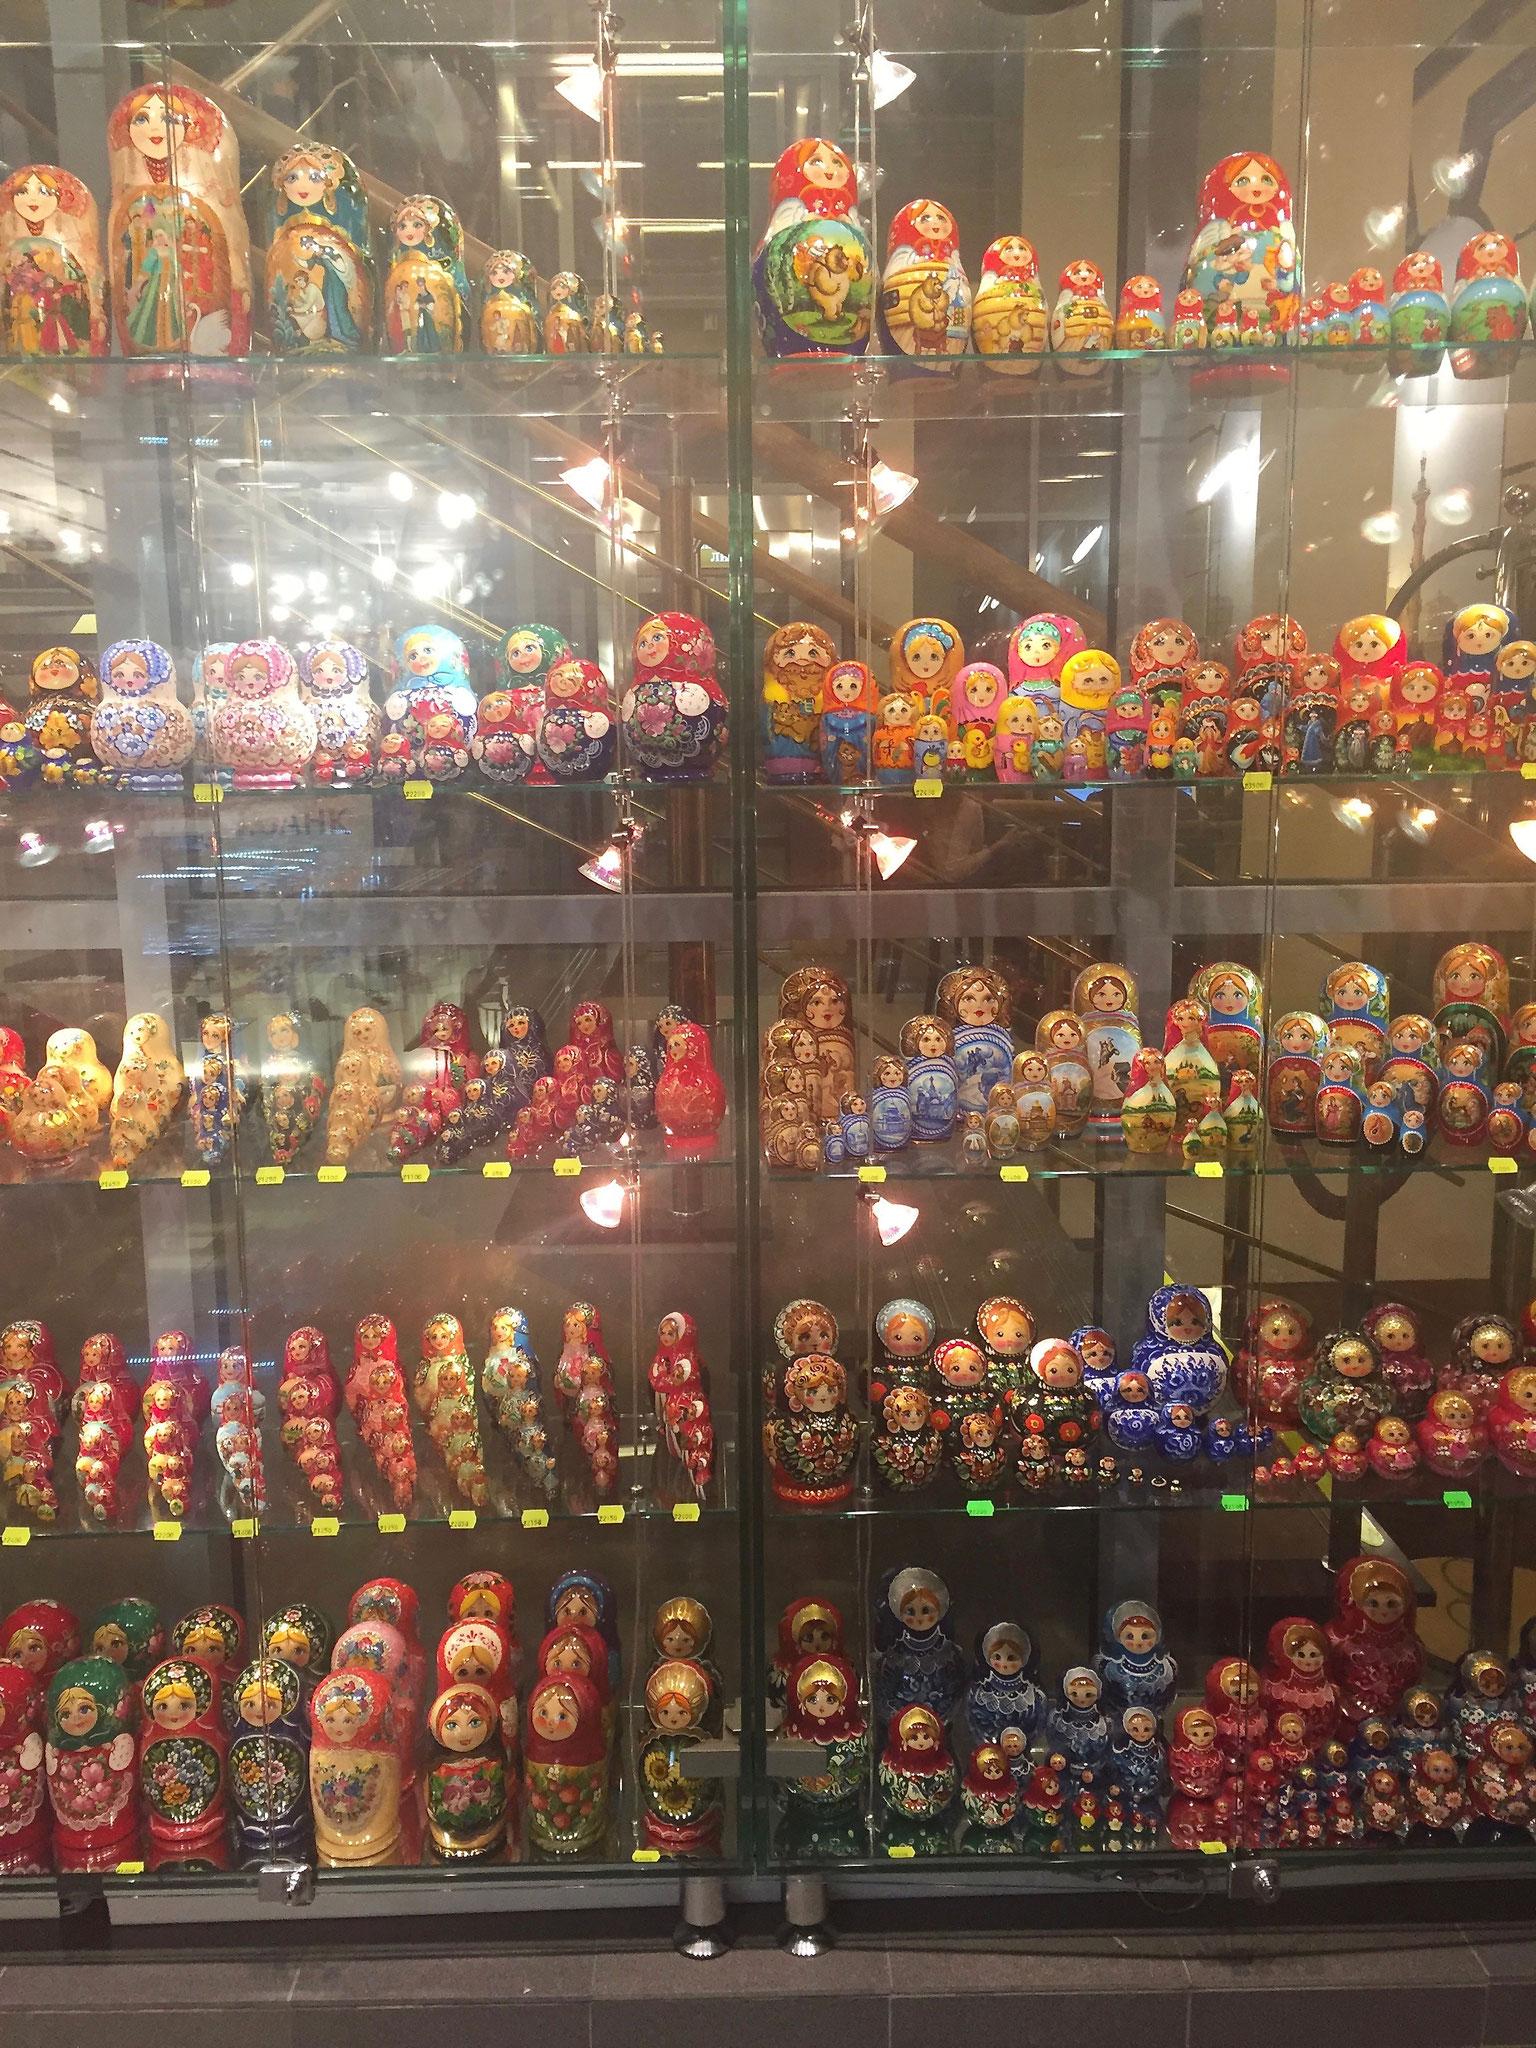 Matyroshka dolls